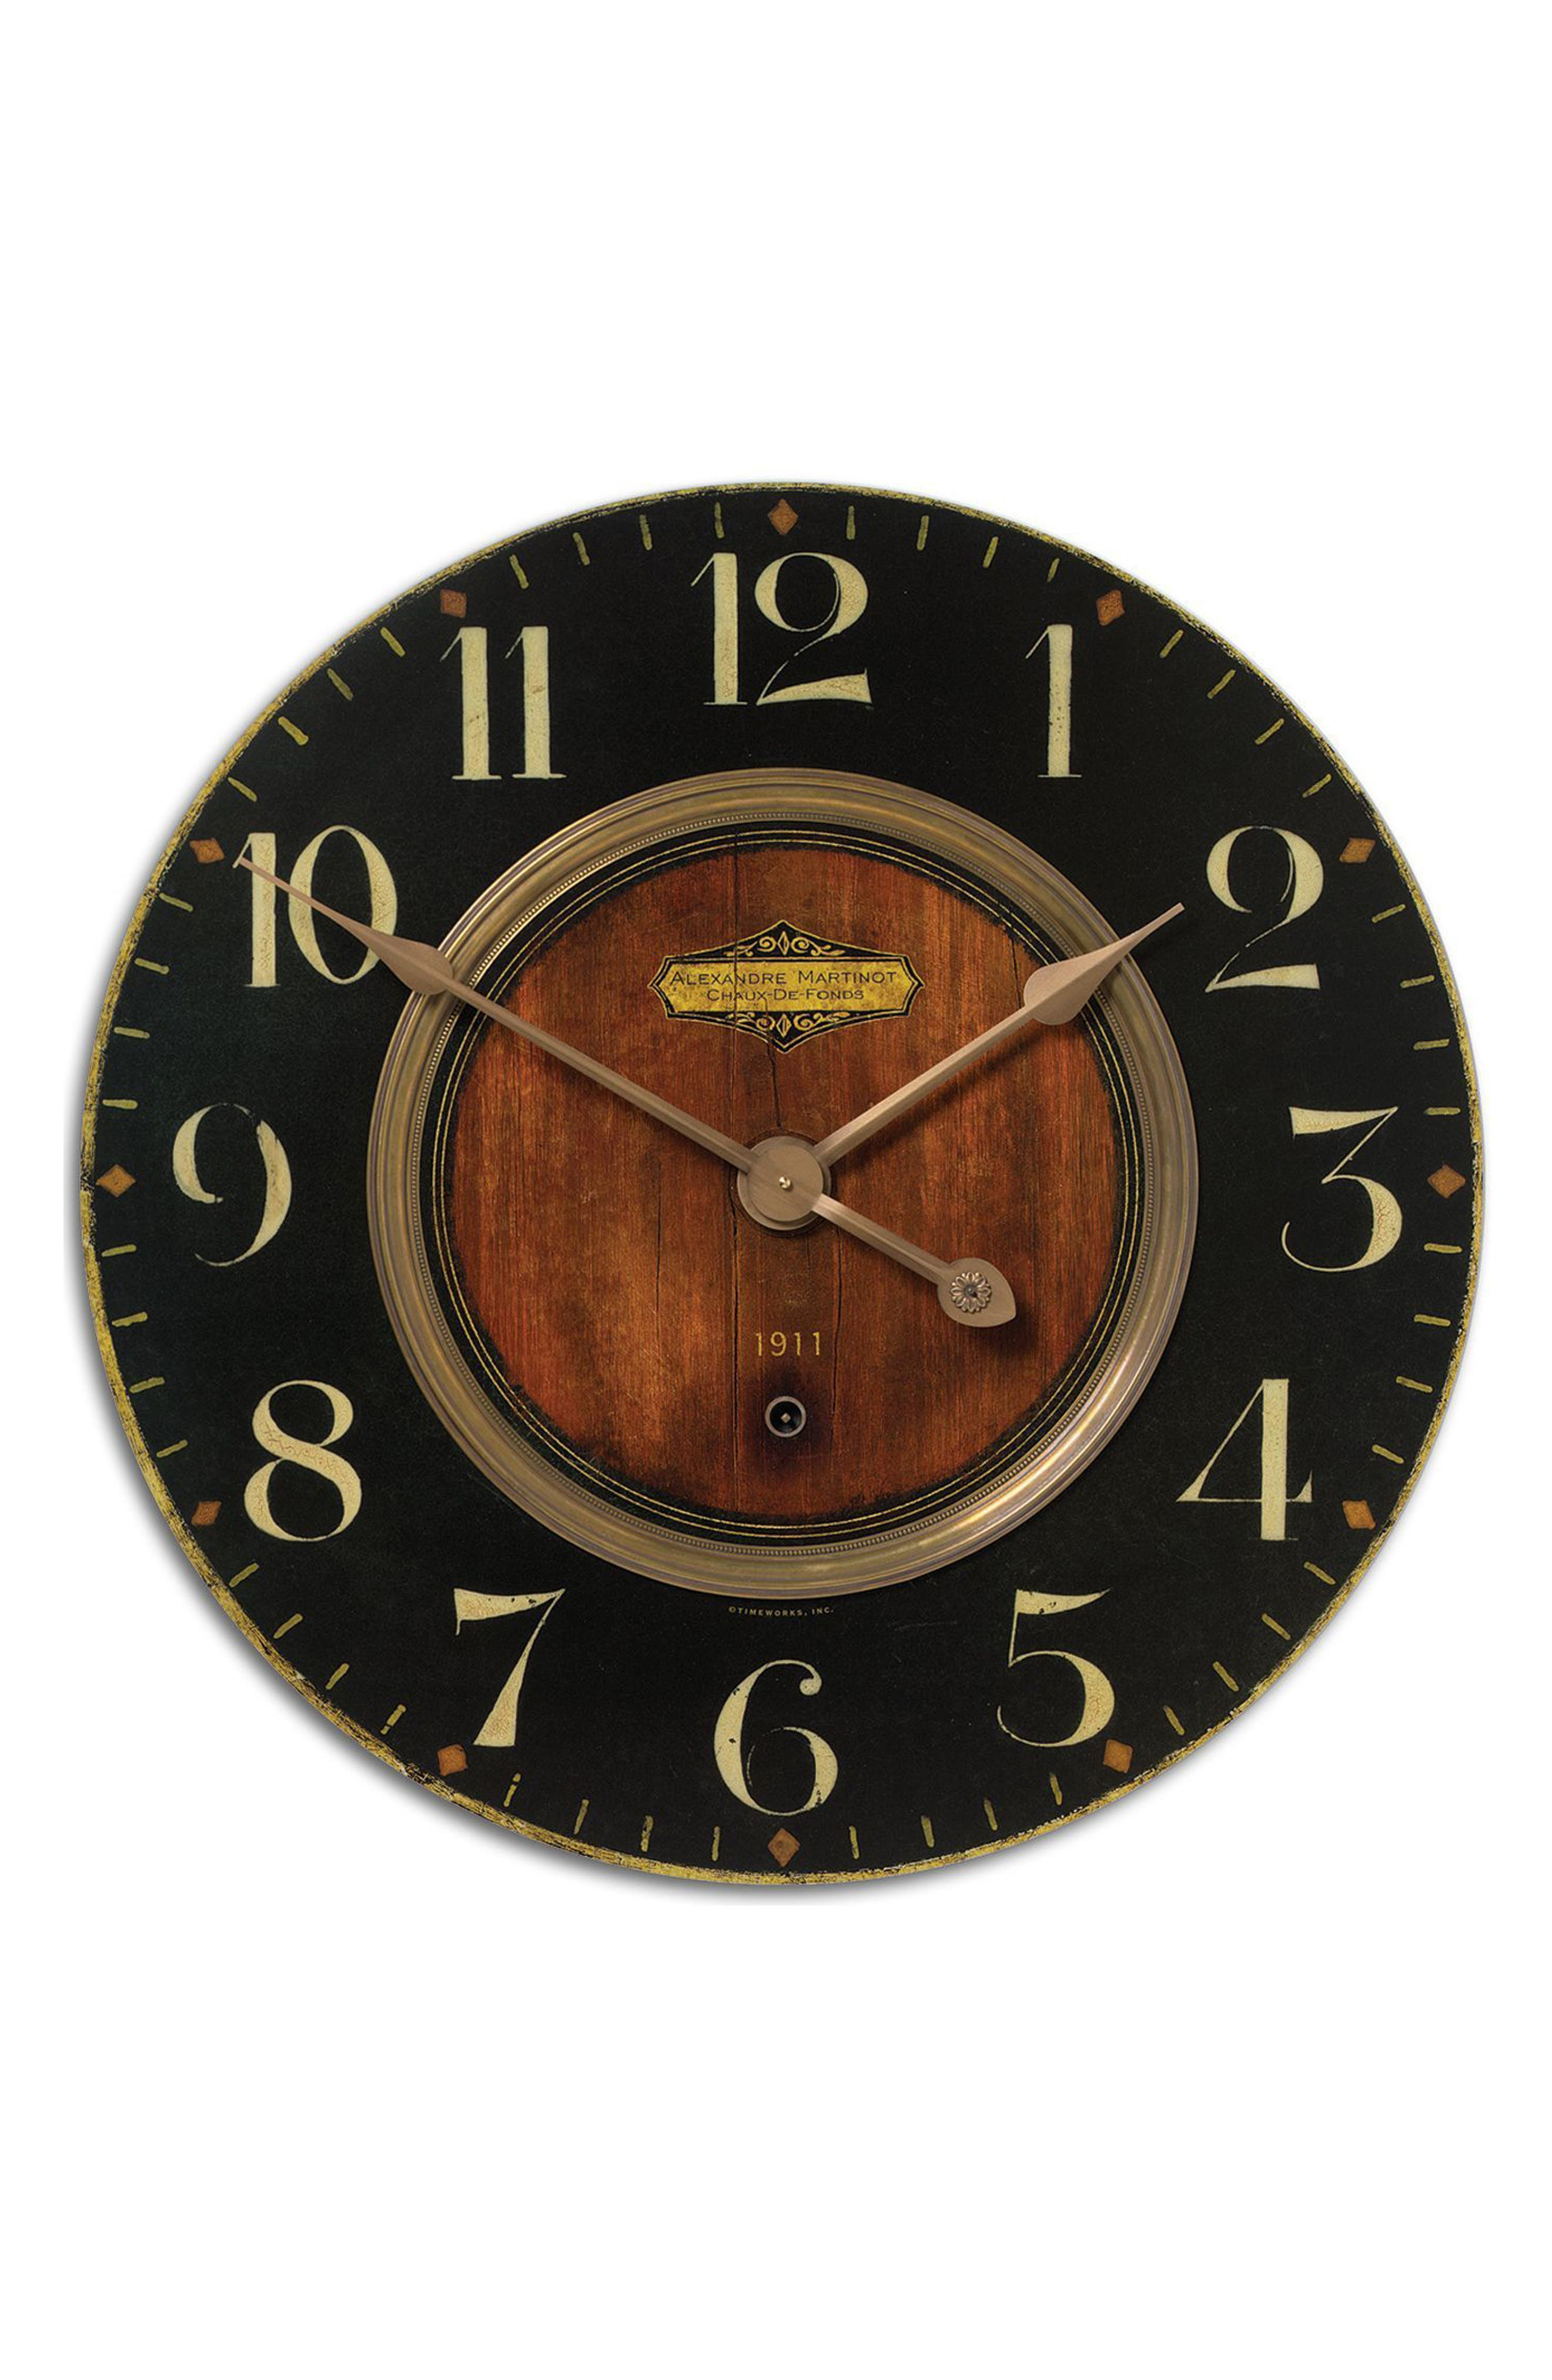 Alexandre Martinot Wall Clock,                             Main thumbnail 1, color,                             Metallic Rust/ Copper